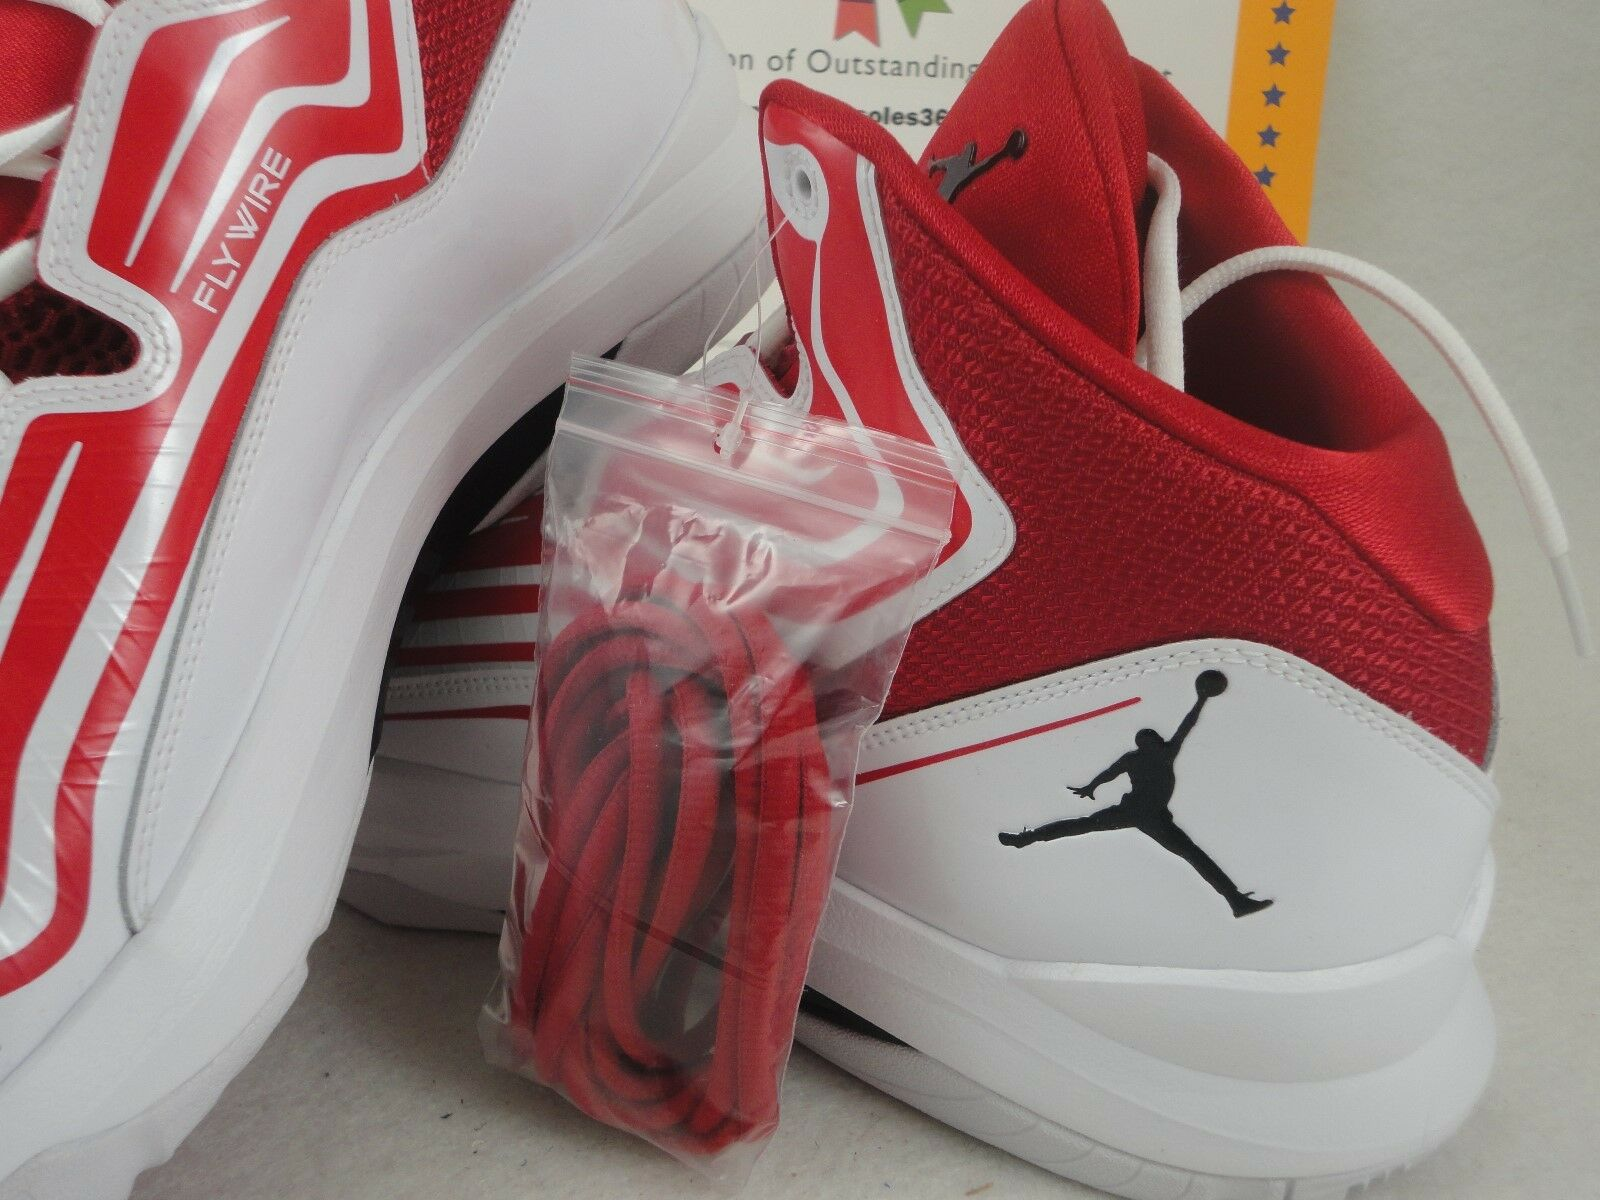 Nike jordan aero mania, palestra rosso / nero / bianco, numero 12